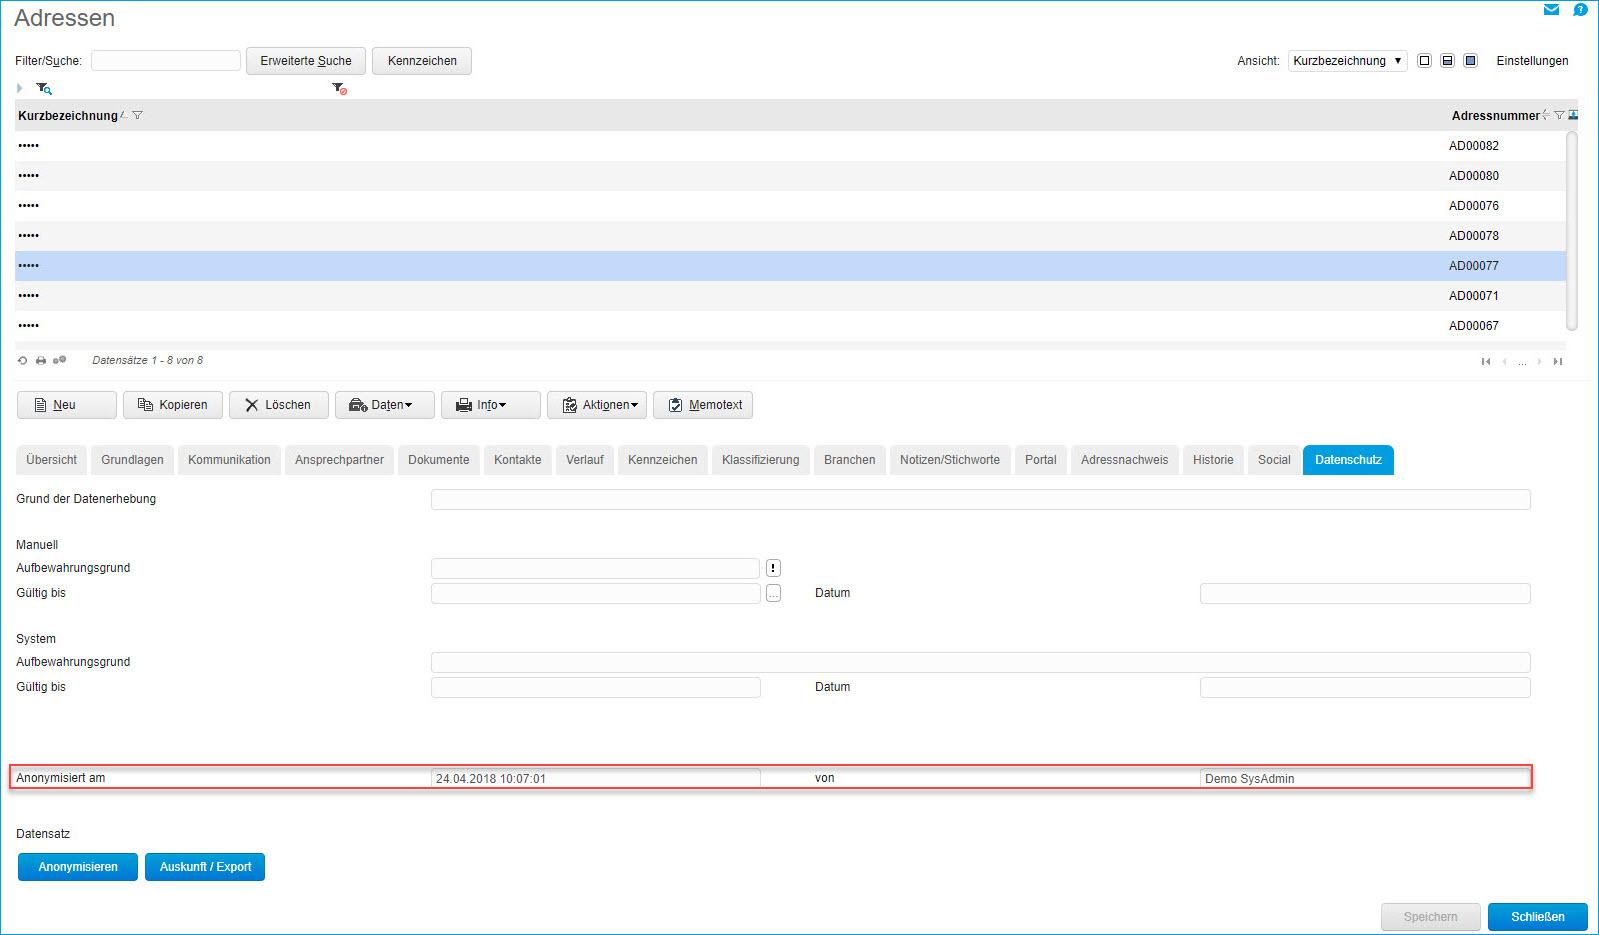 Register Datenschutz 3